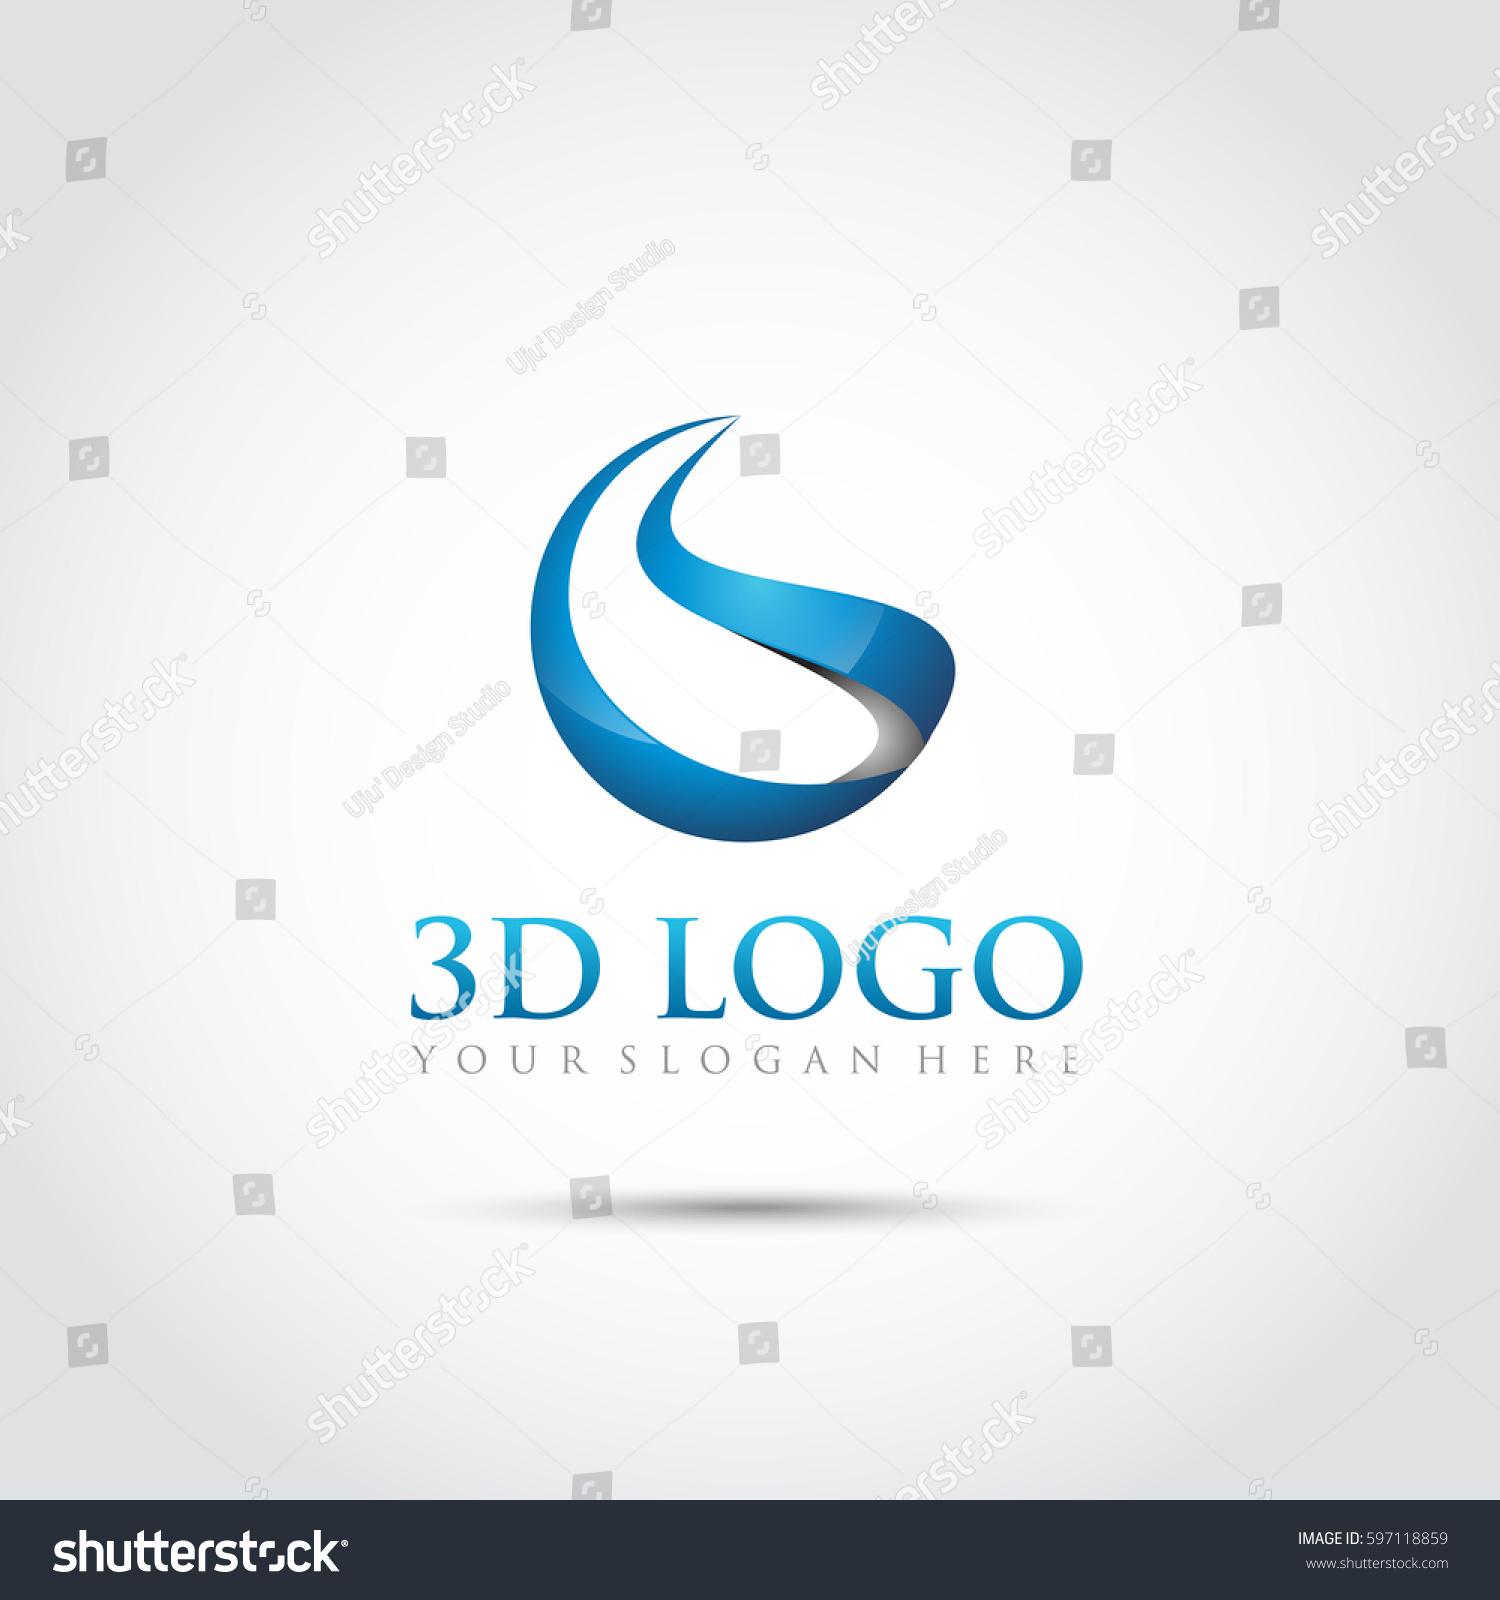 abstract 3d logo template vector illustrator stock vector 597118859 shutterstock. Black Bedroom Furniture Sets. Home Design Ideas